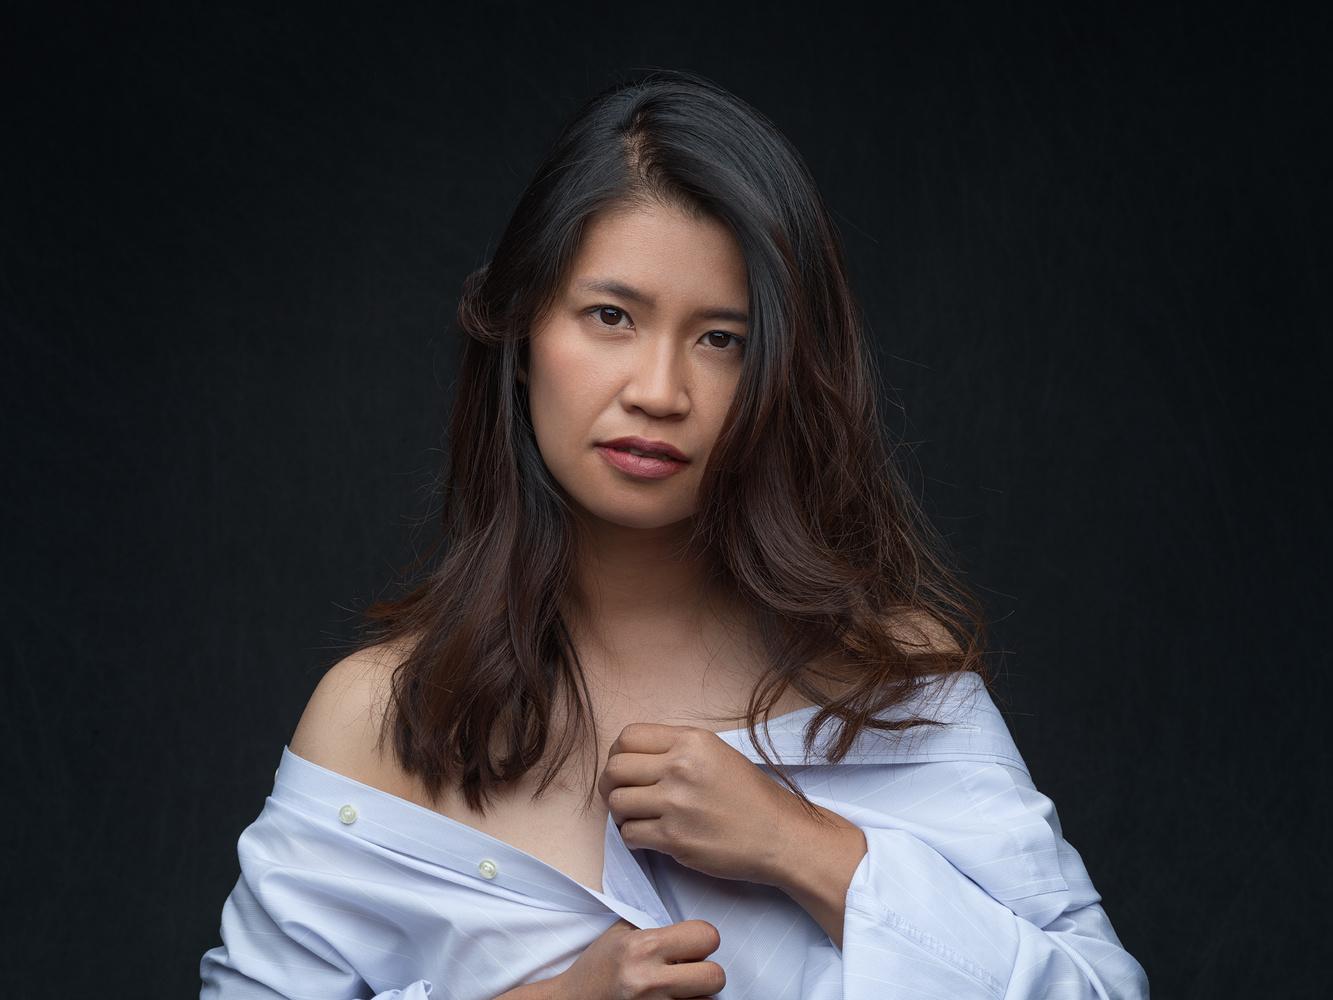 LeAnne Liu by Daniel Medley